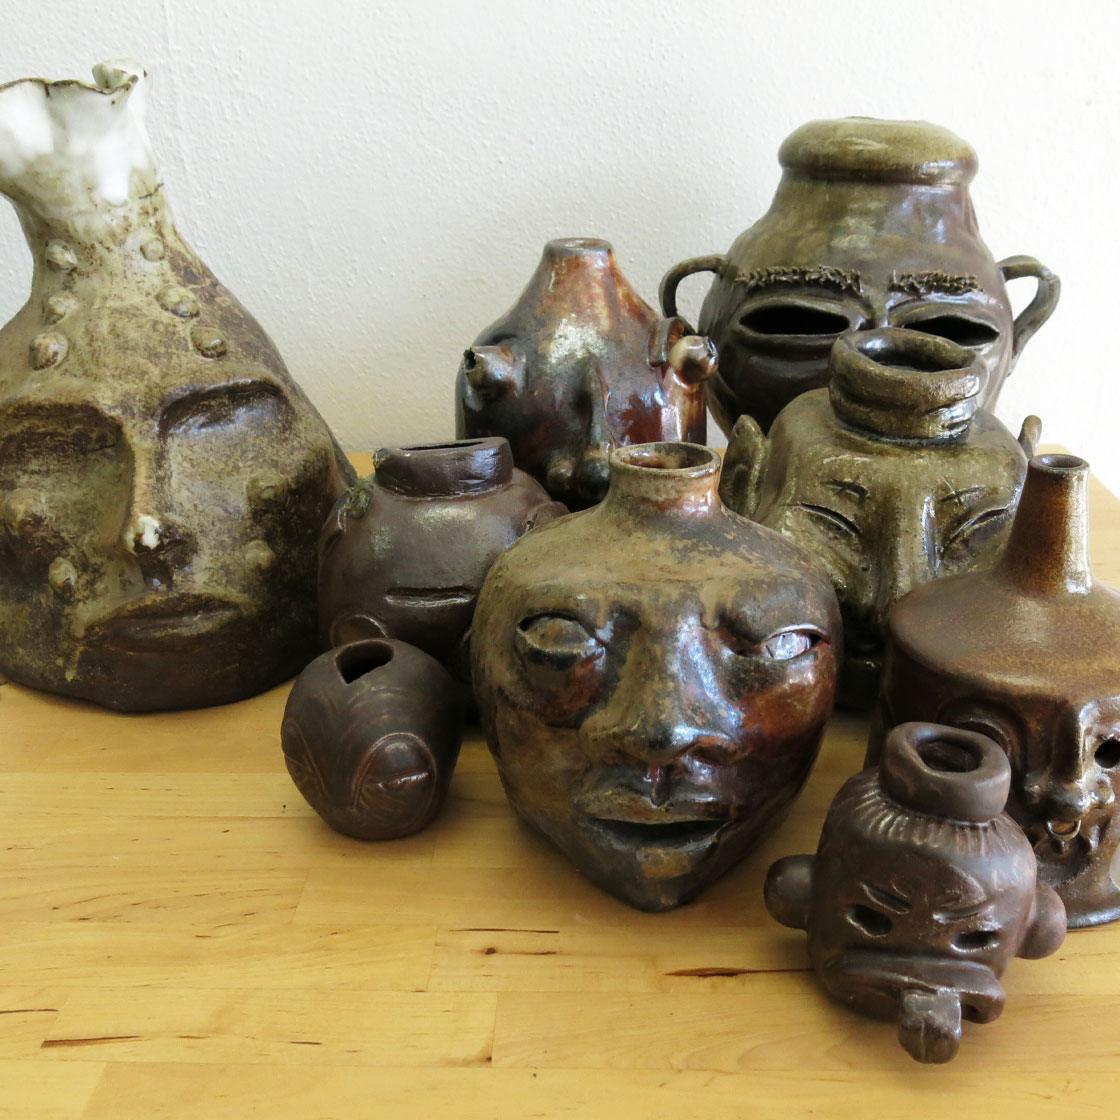 Handcrafted ceramic works